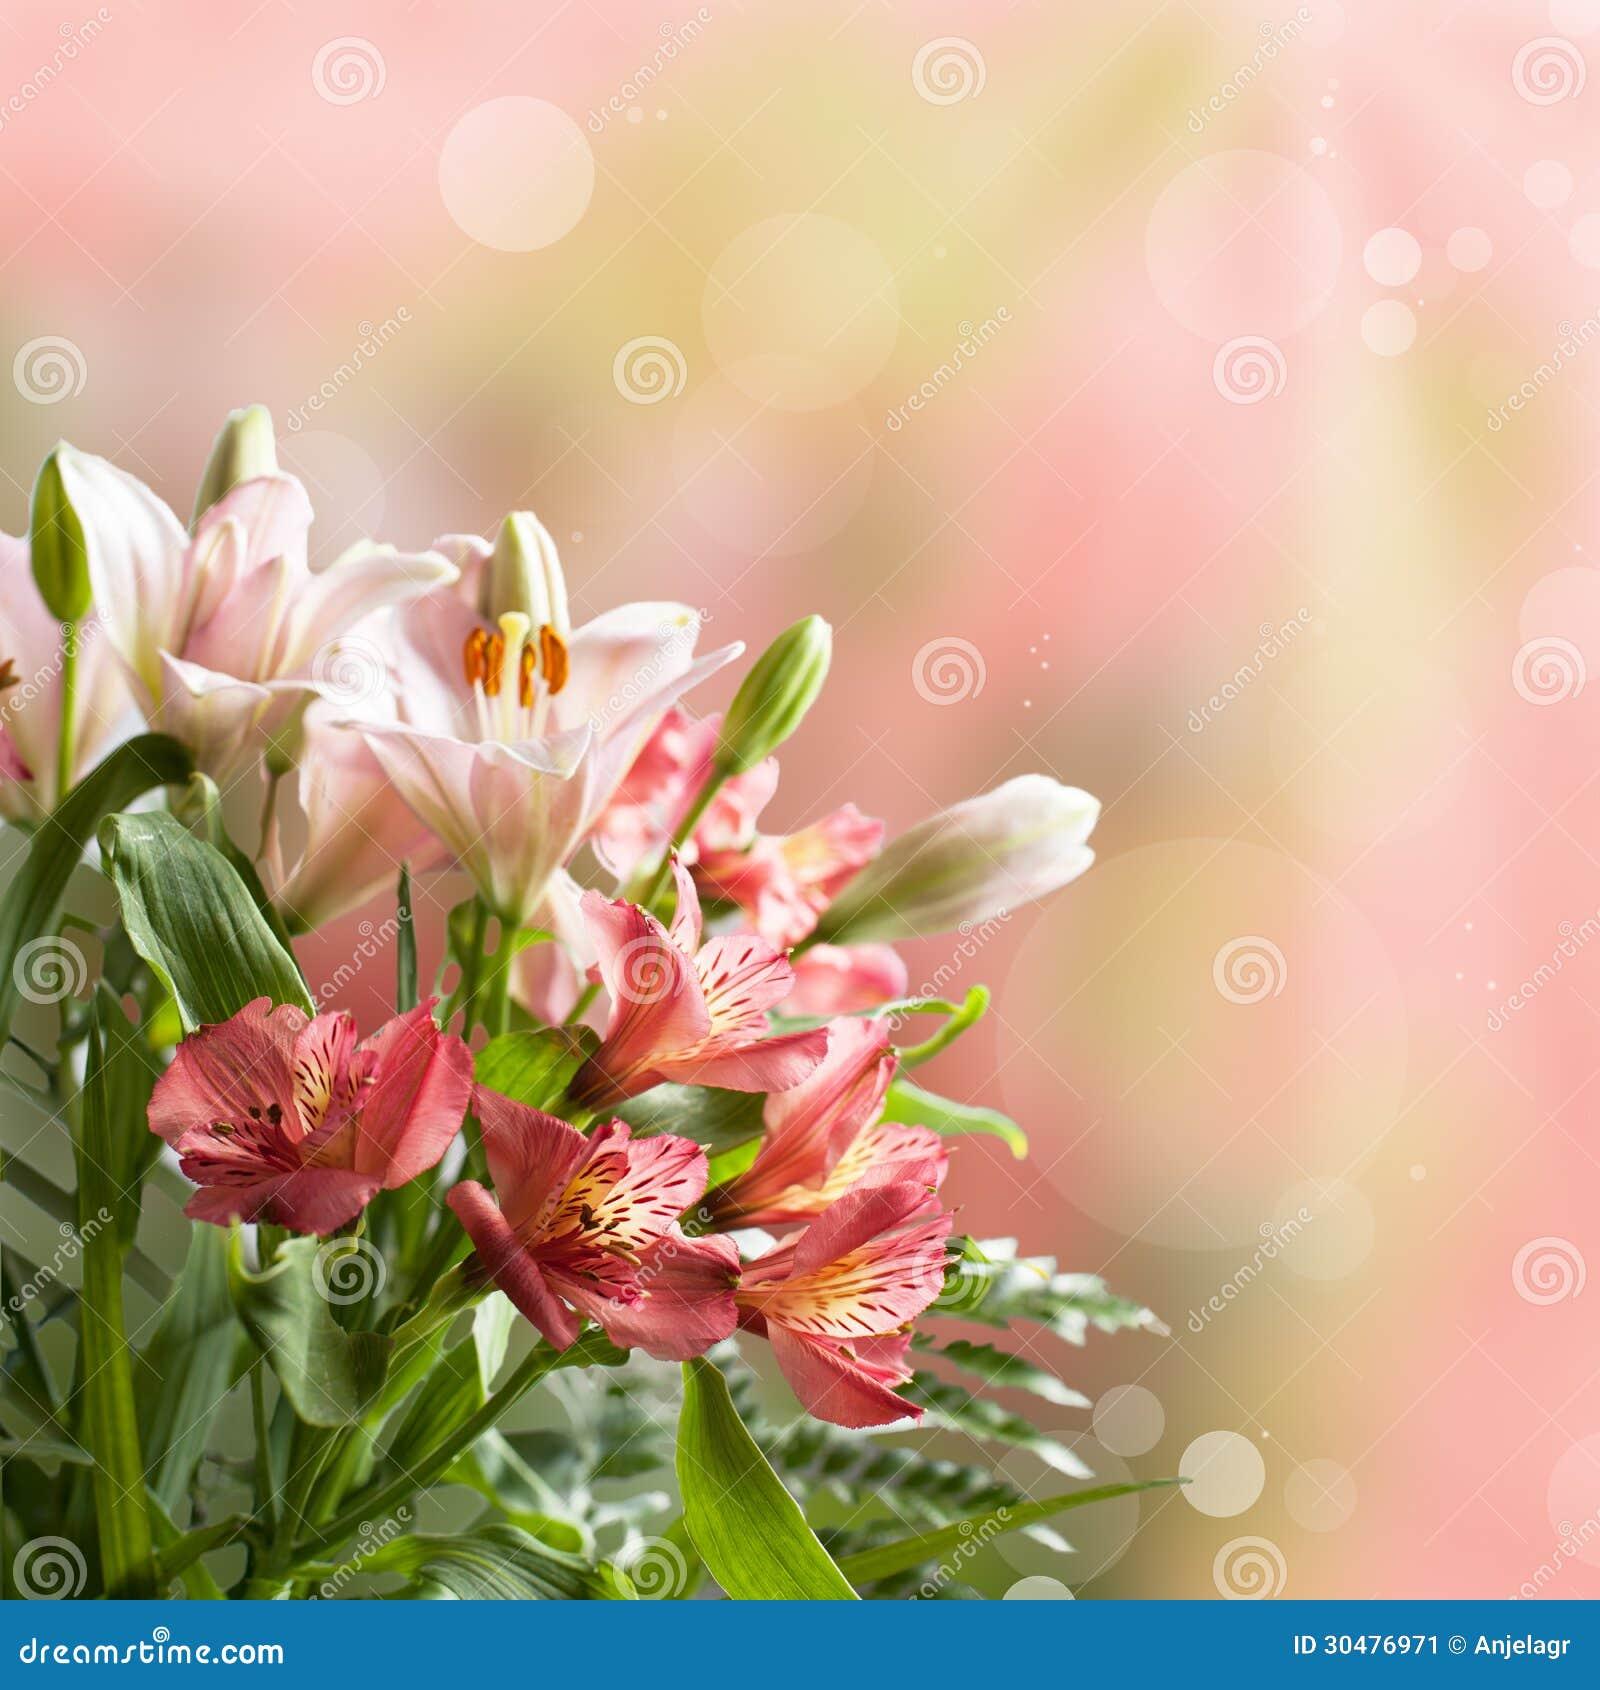 Bokeh Flowers Wedding: Bouquet Of Beautiful Pink Flowers With Bokeh Stock Image